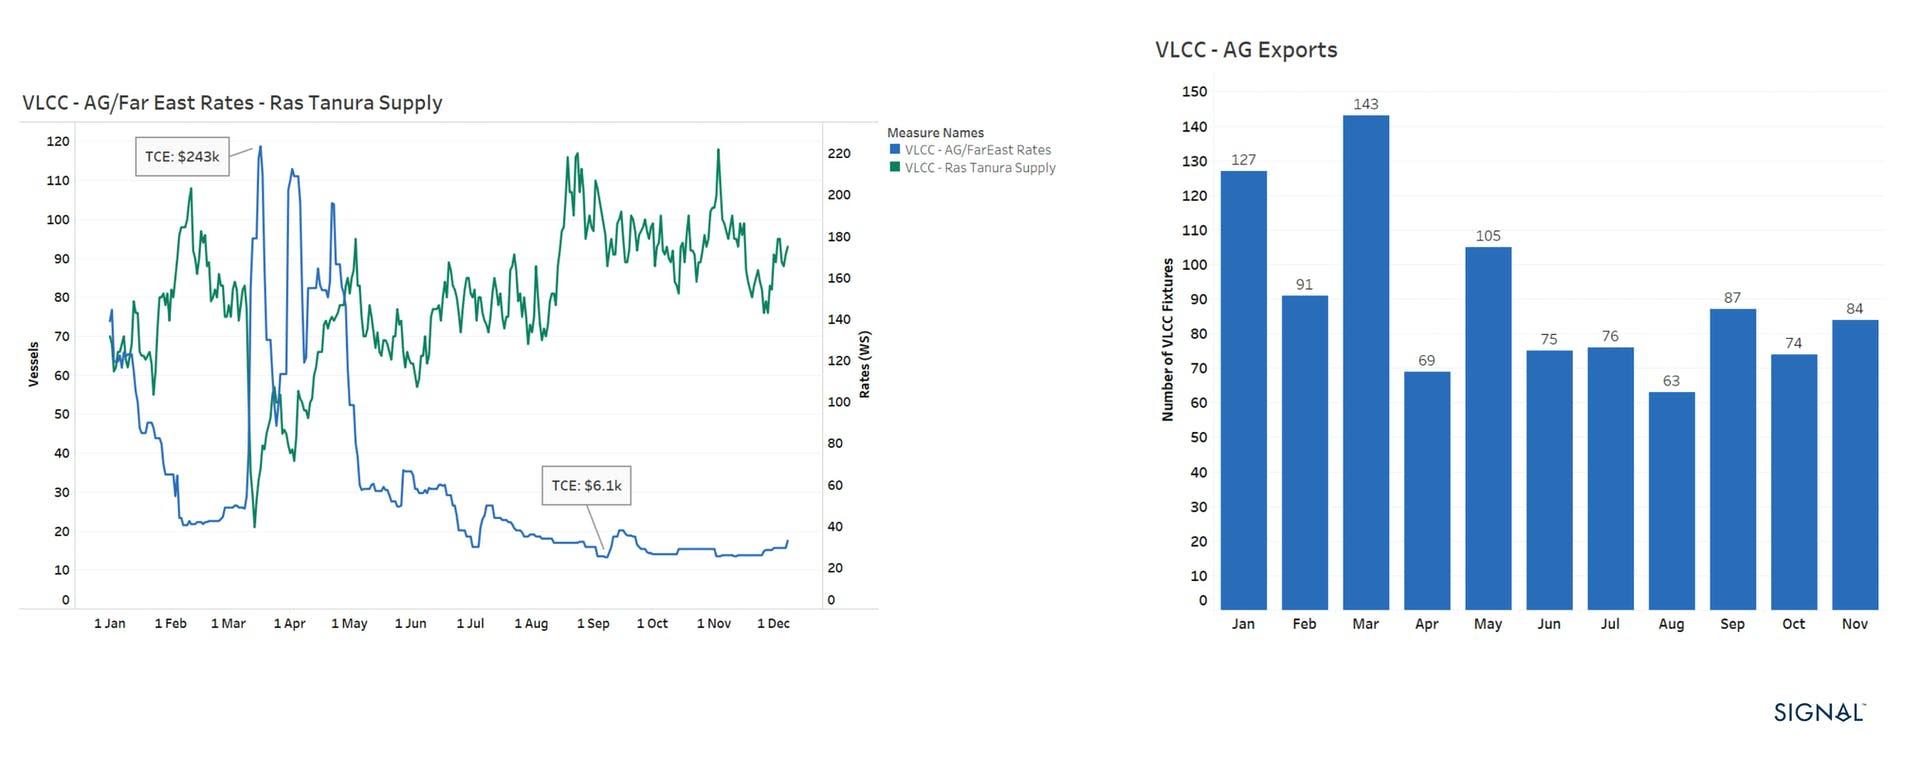 Dirty Tankers - VLCCs